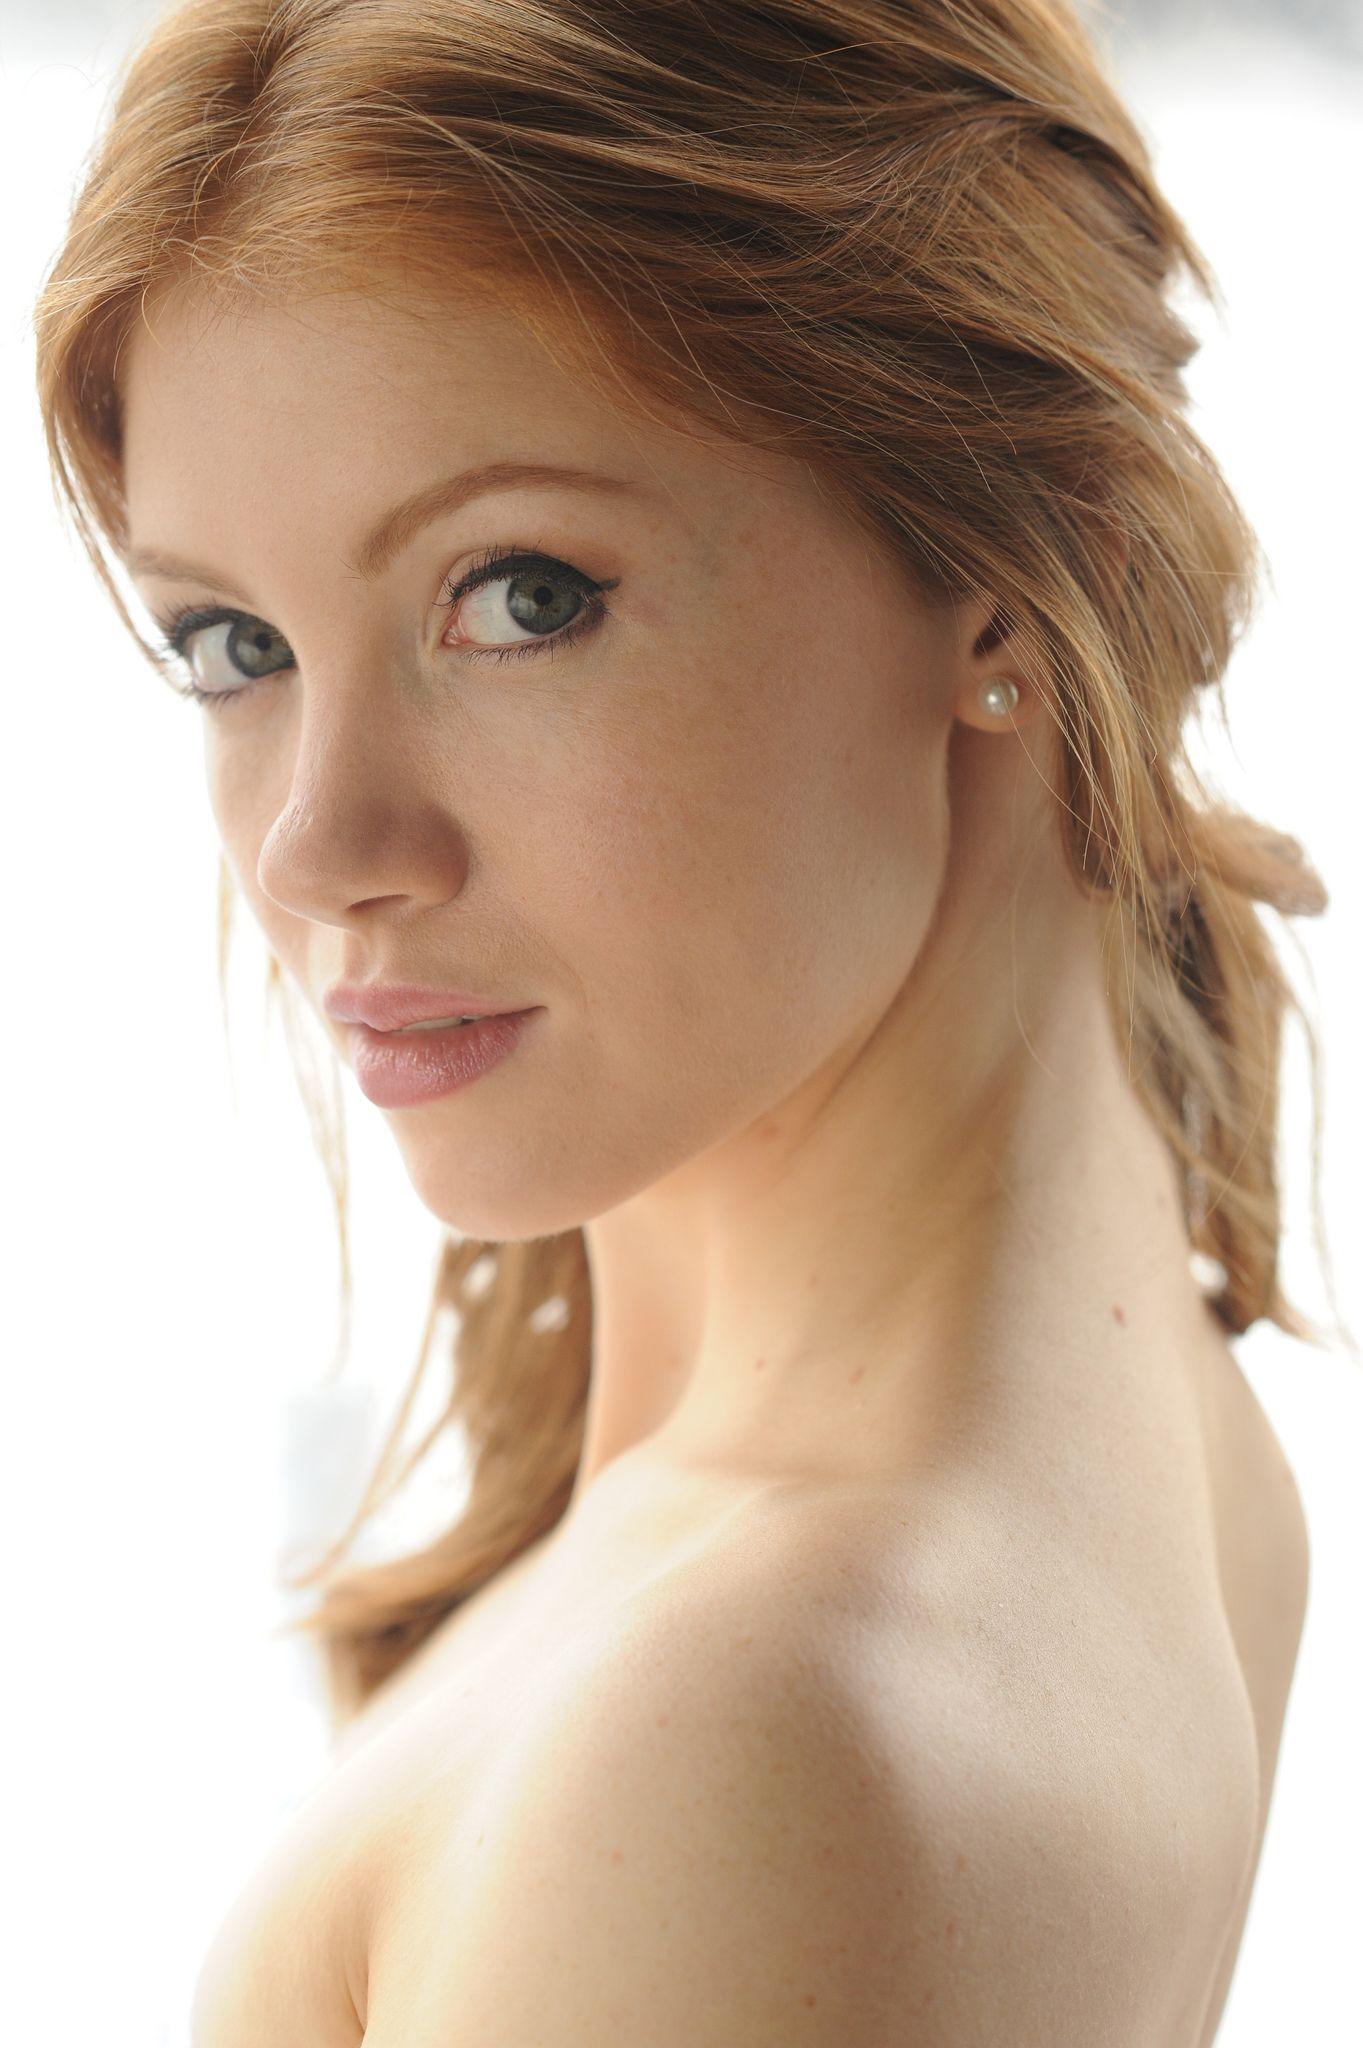 Adrianne babeau topless high definition — photo 8